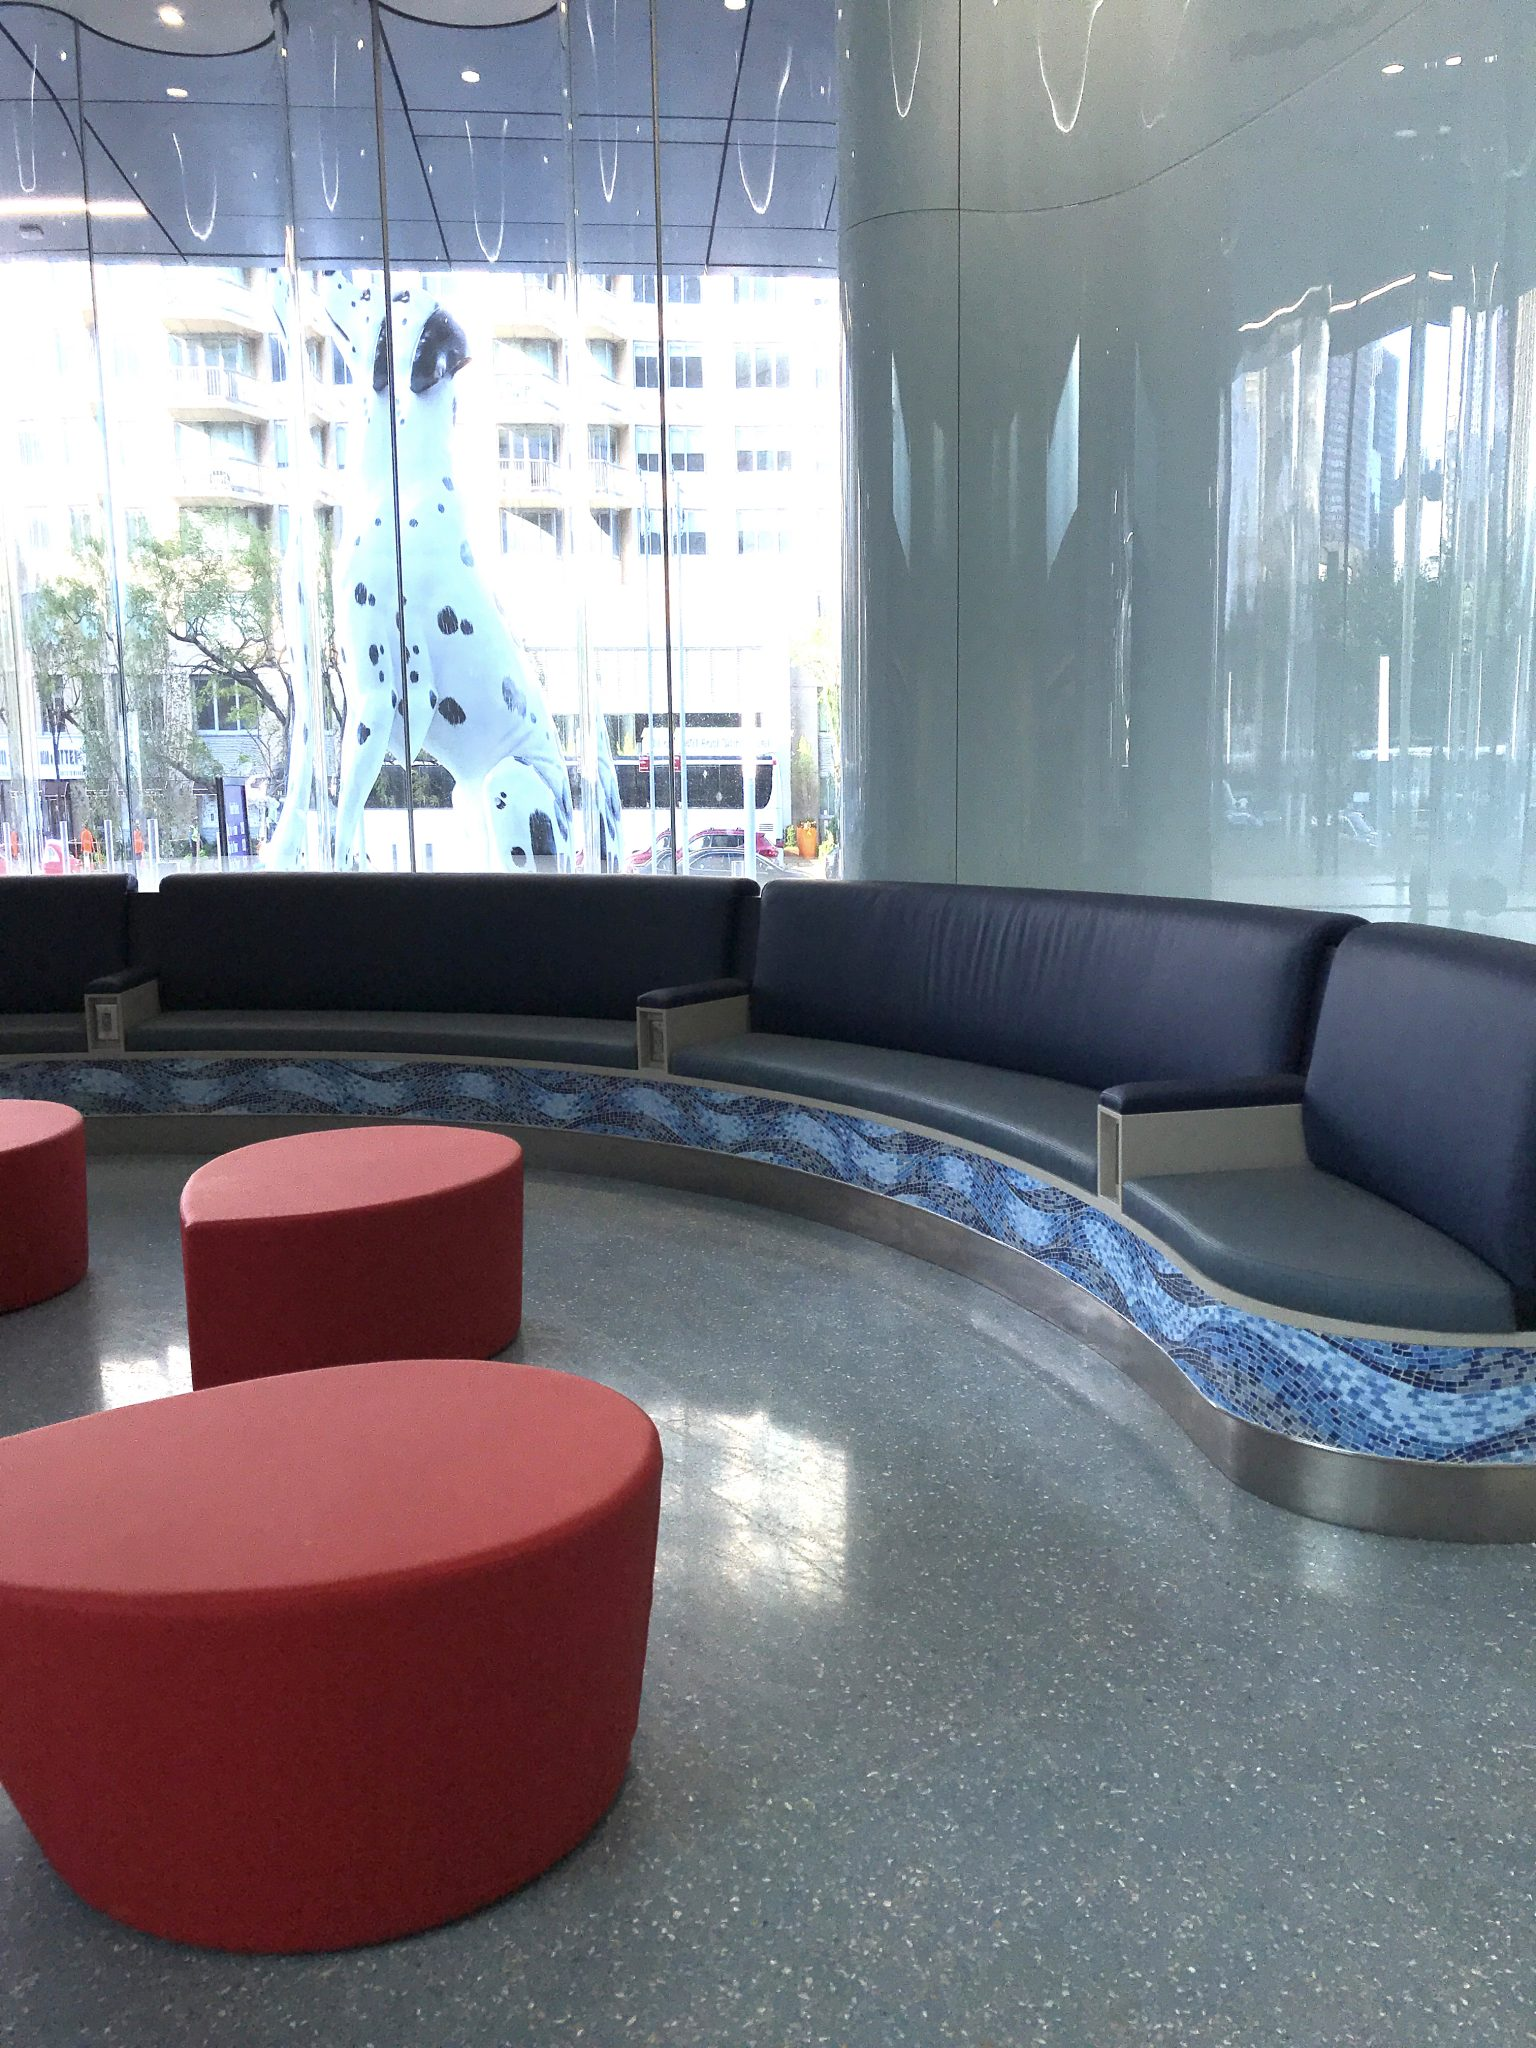 wavy-bench-mosaic-3